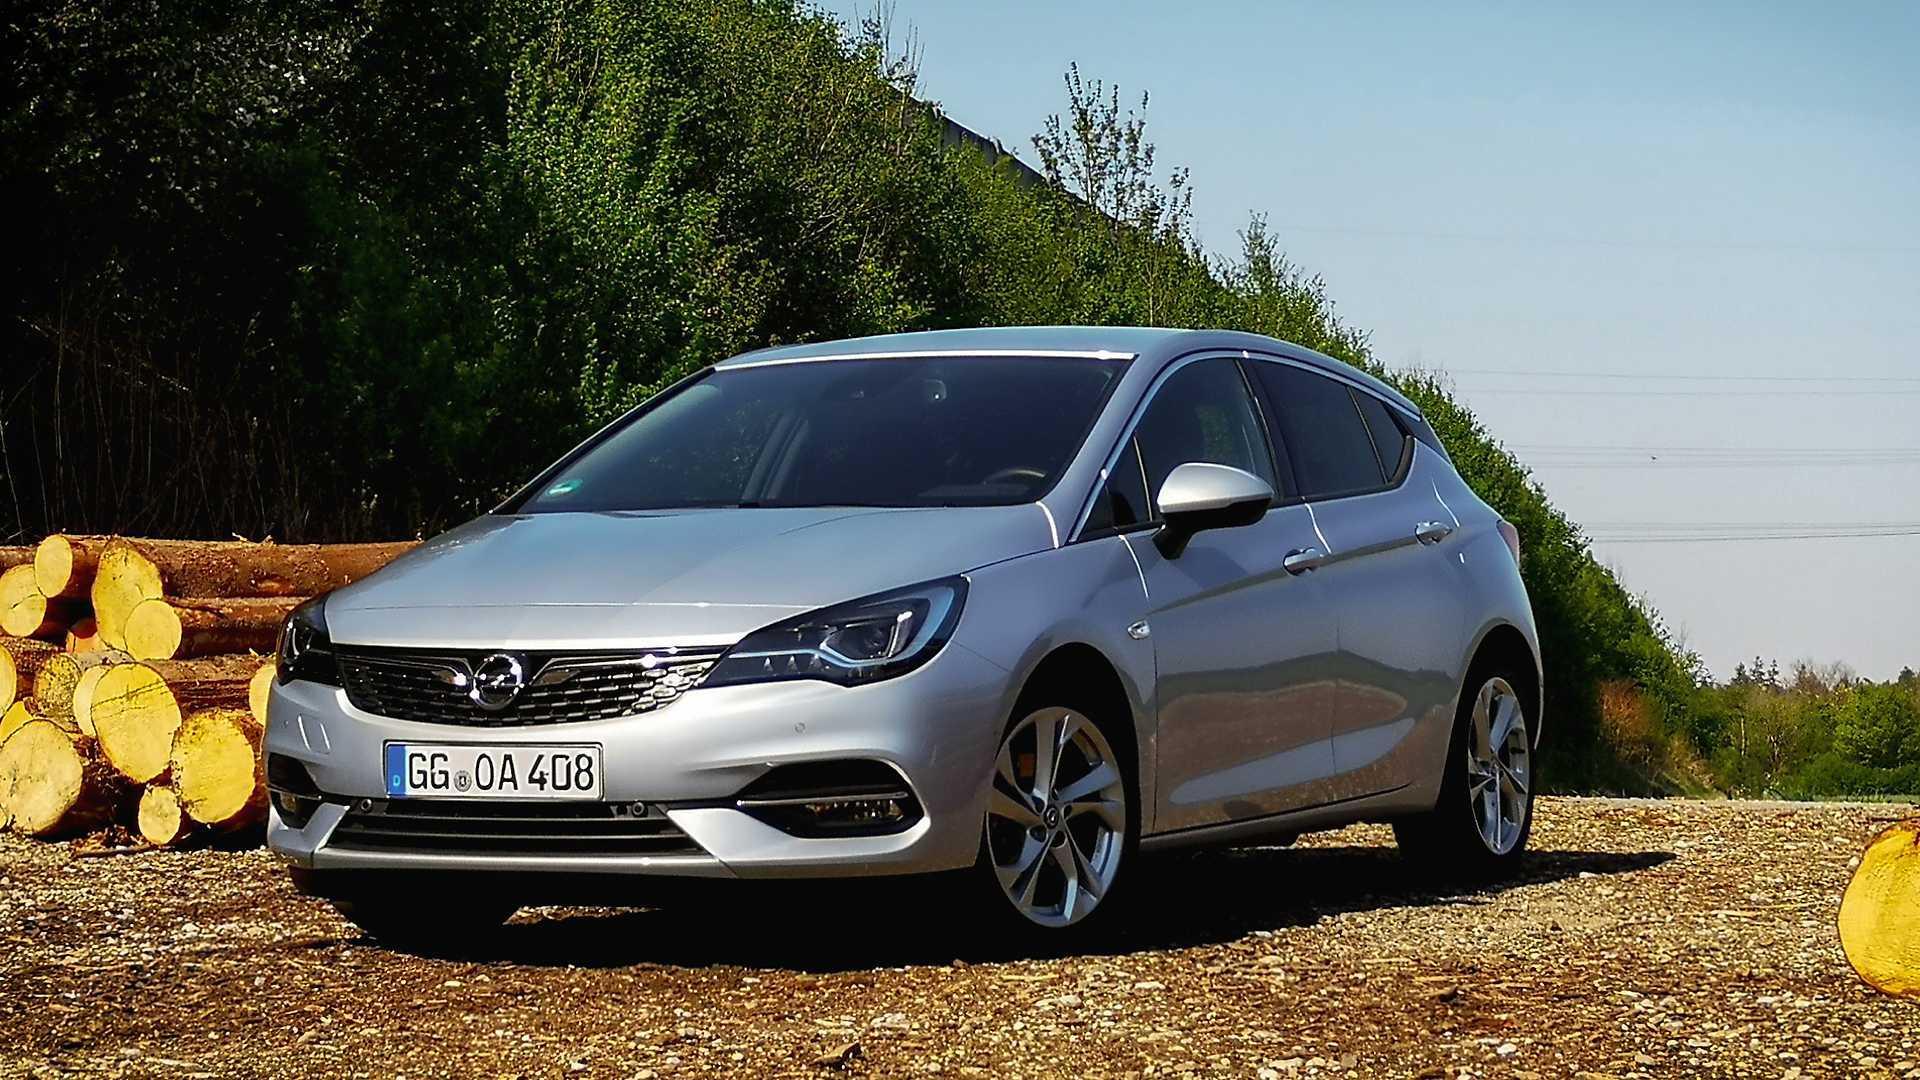 2020 Opel Astra Price